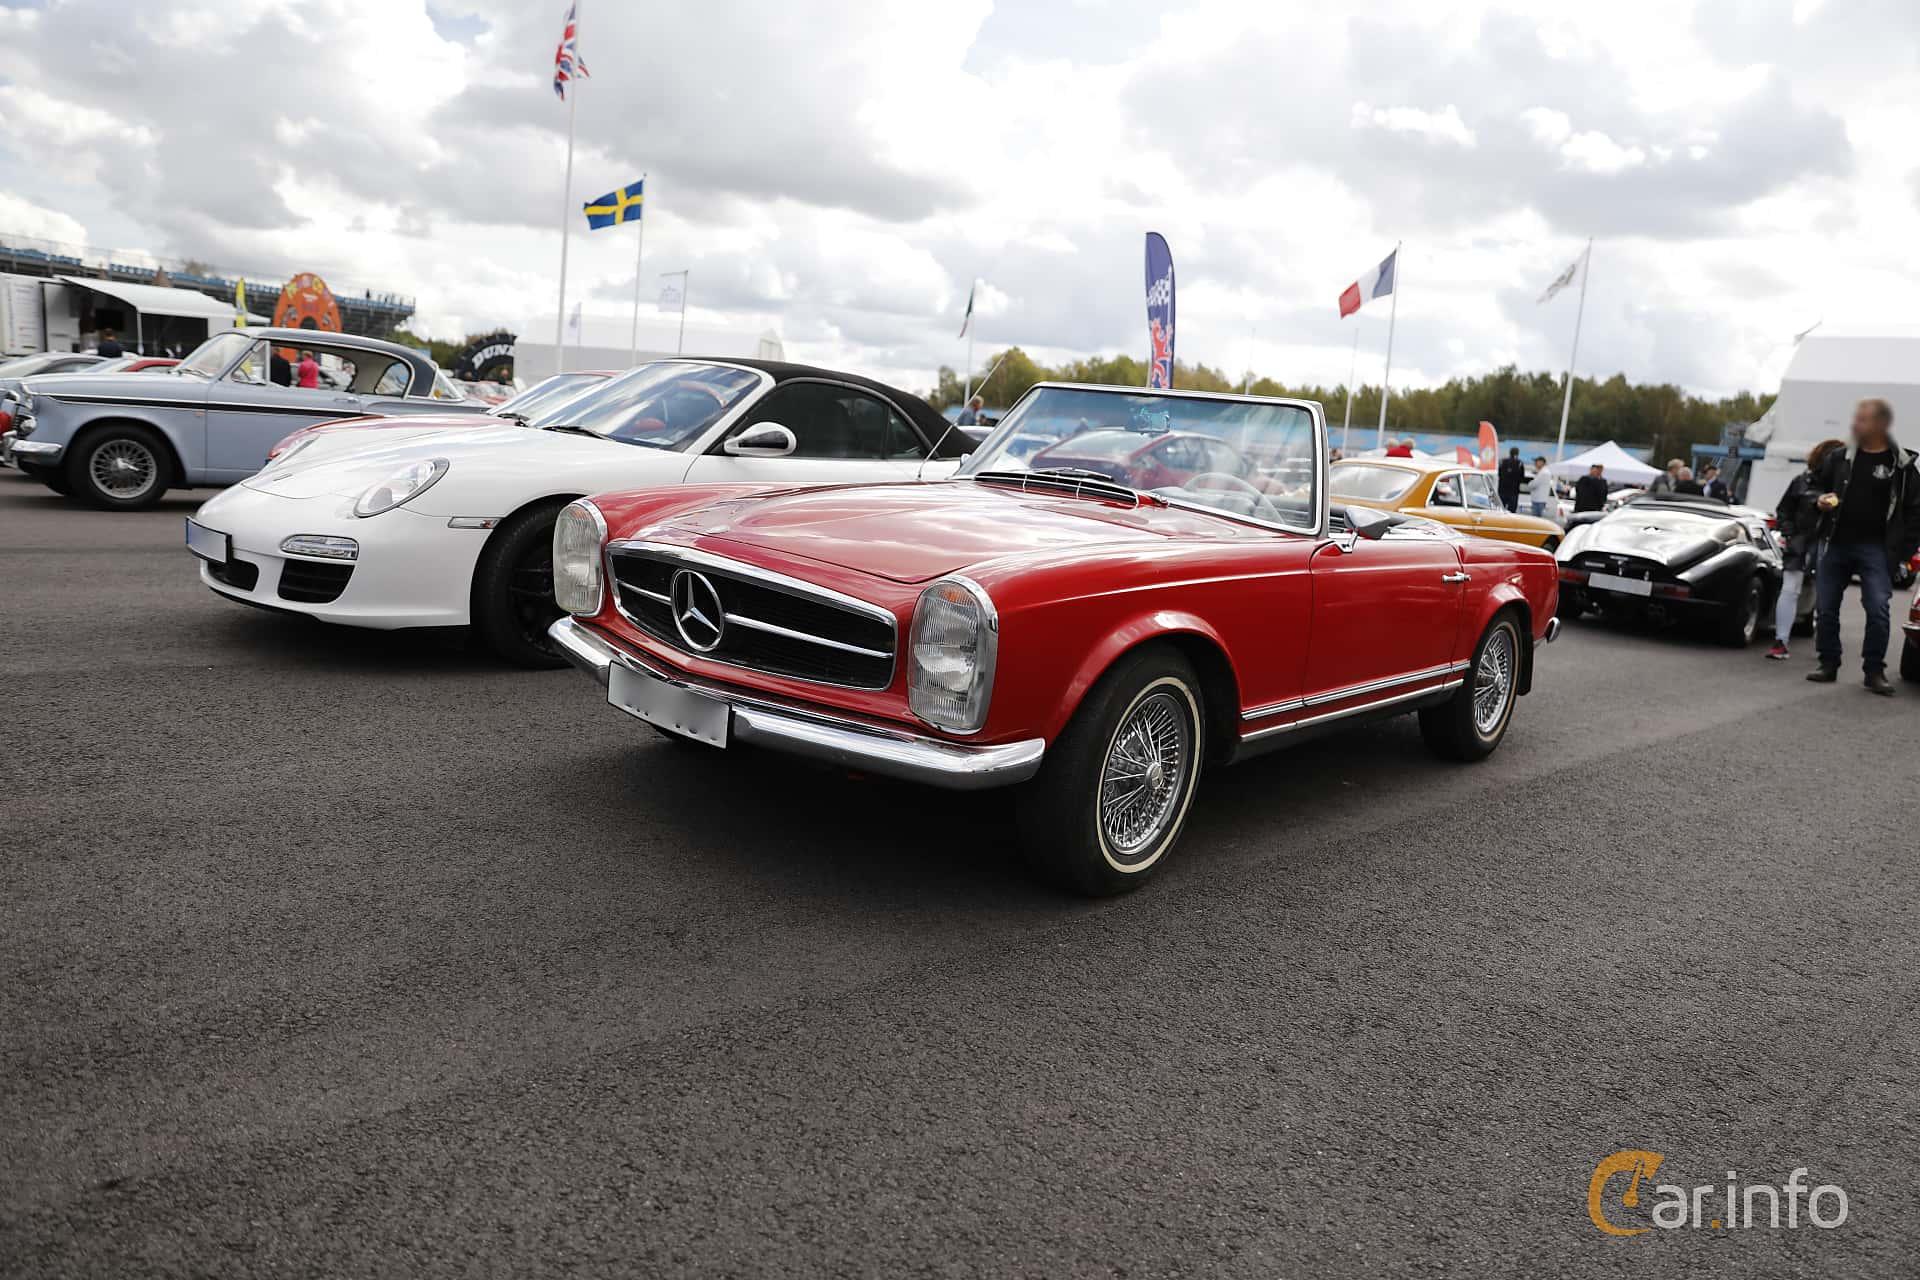 Mercedes-Benz 230 SL  Manual, 150hp, 1965 at Nostalgia Racing Days / Mantorp Classic Festi 2018